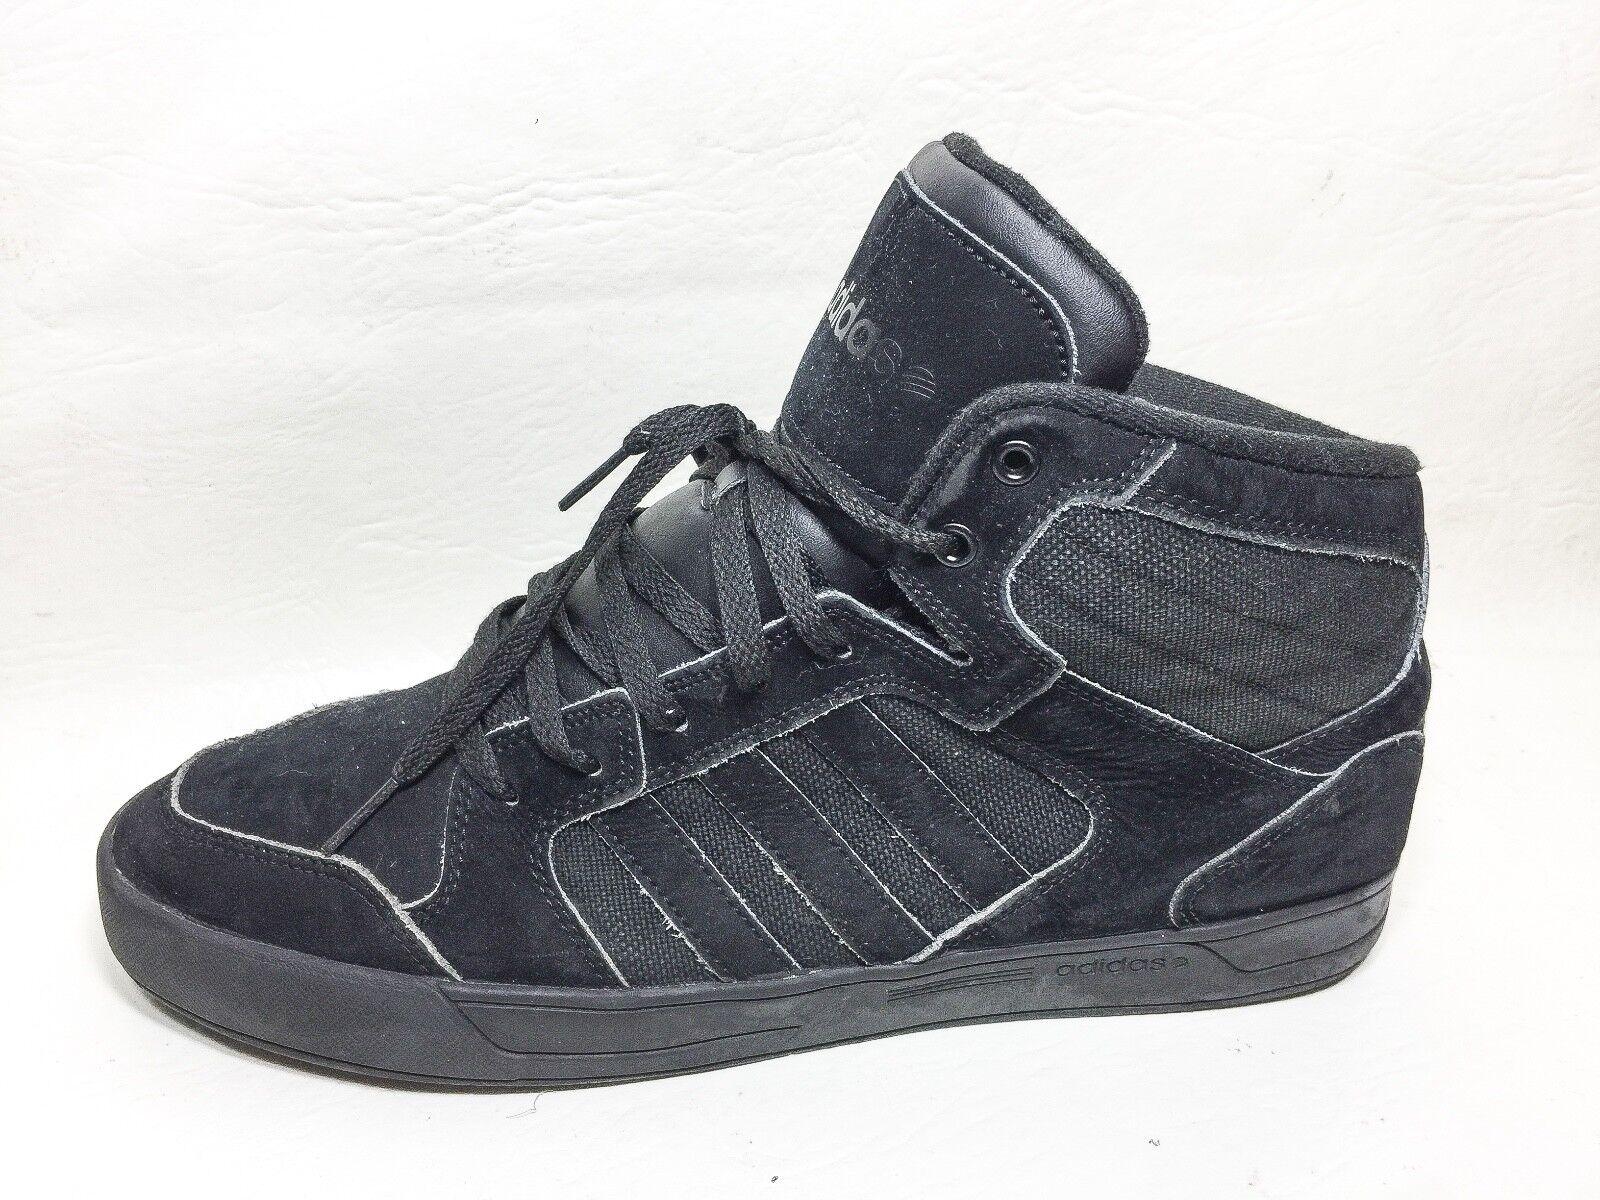 Adidas Neo Label Hi Cut Athletic Sneakers Mens Shoes Size 12 Eur 11.5 Black